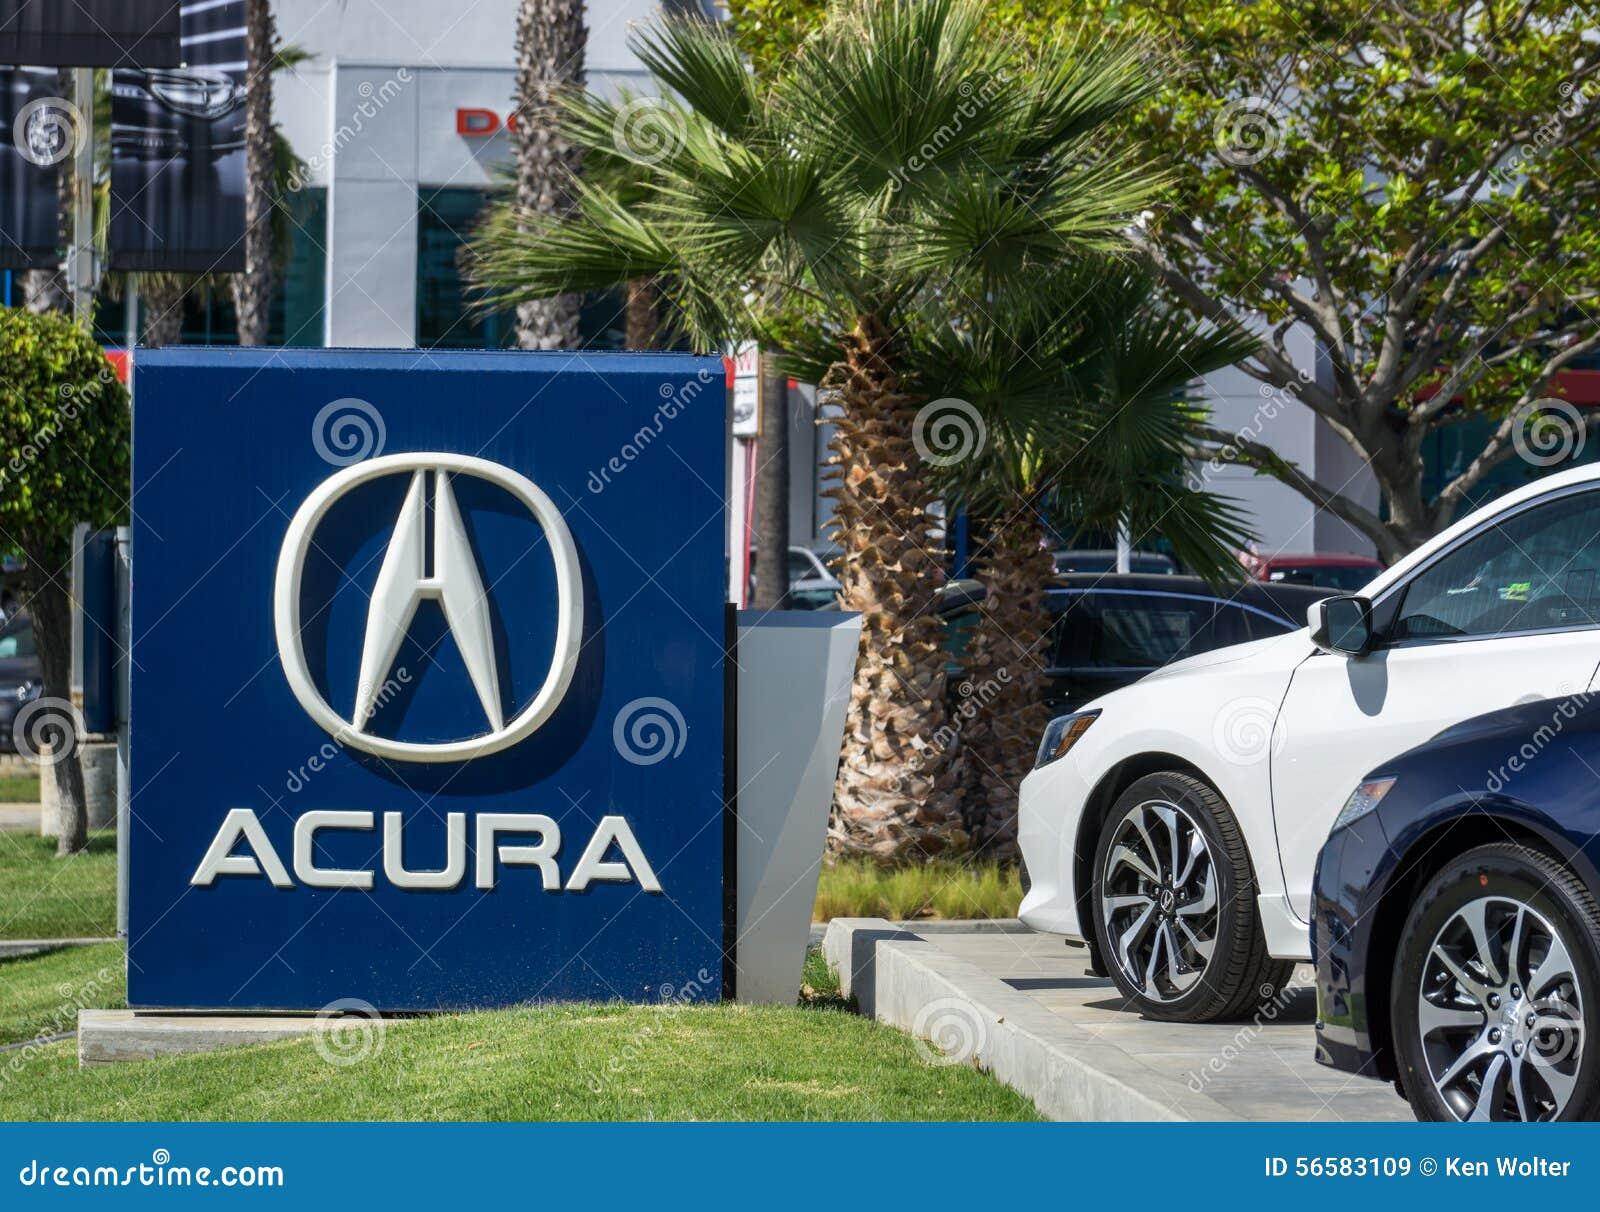 acura automobile dealership sign and logo editorial stock image image 56583109. Black Bedroom Furniture Sets. Home Design Ideas